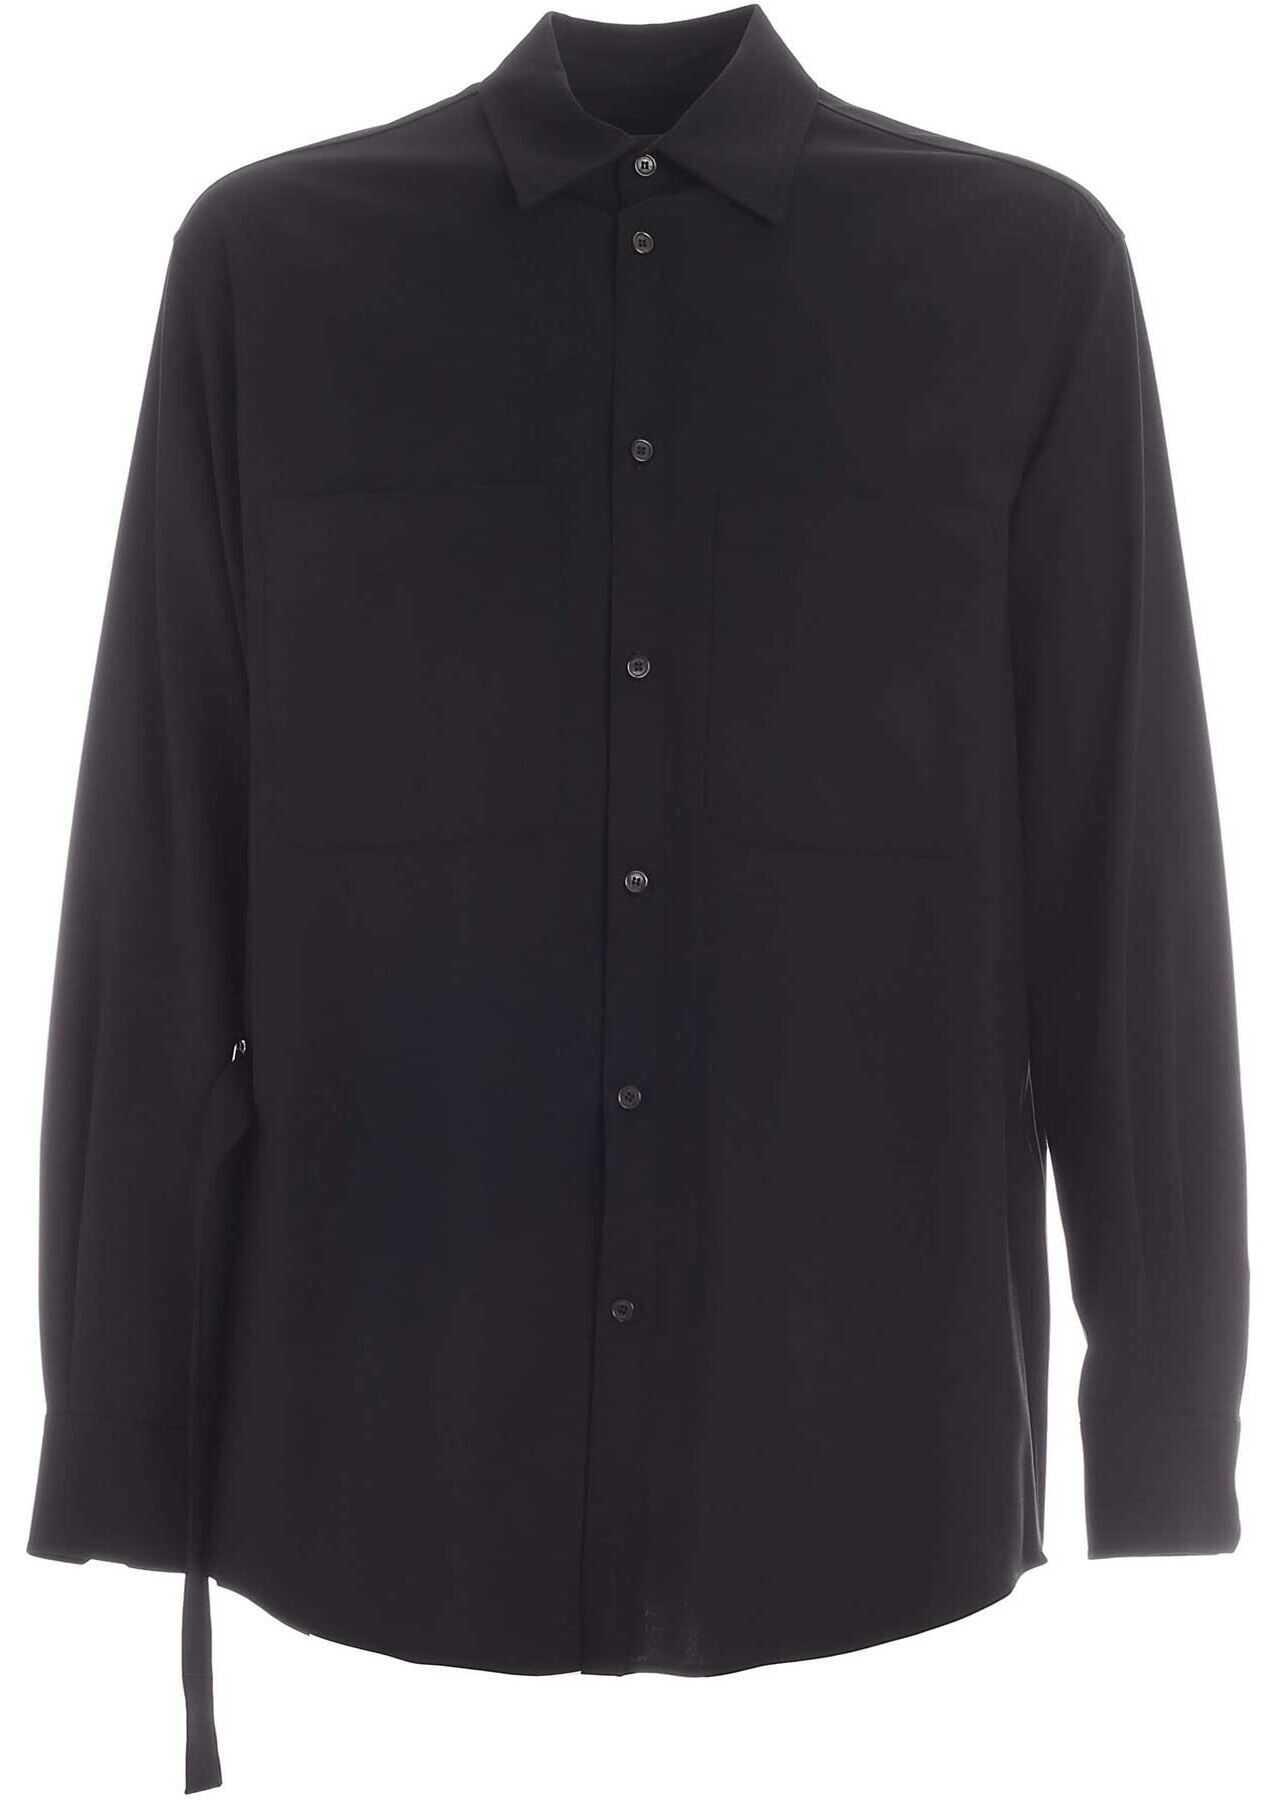 Valentino Garavani Buckle Detail Shirt In Black Black imagine